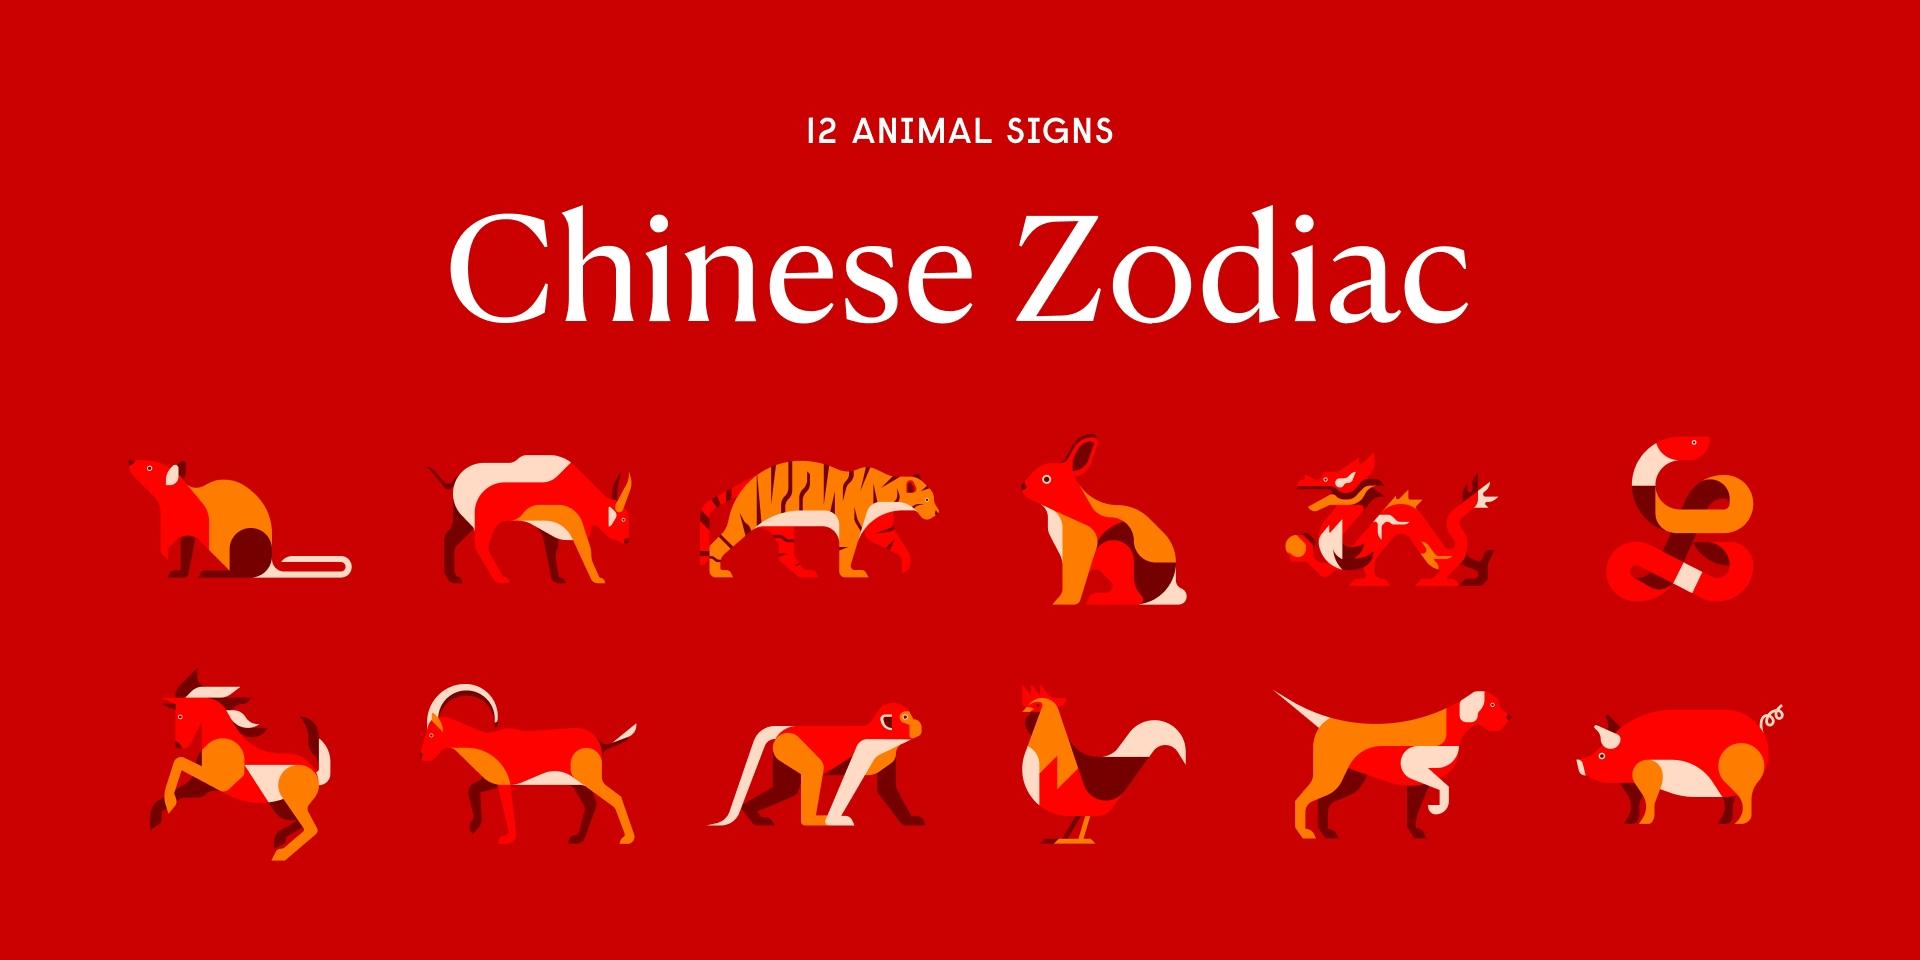 Chinese Zodiac: 12 Animal Signs, Compatibility, Horoscopes Lunar New Year Zodiac Calendar